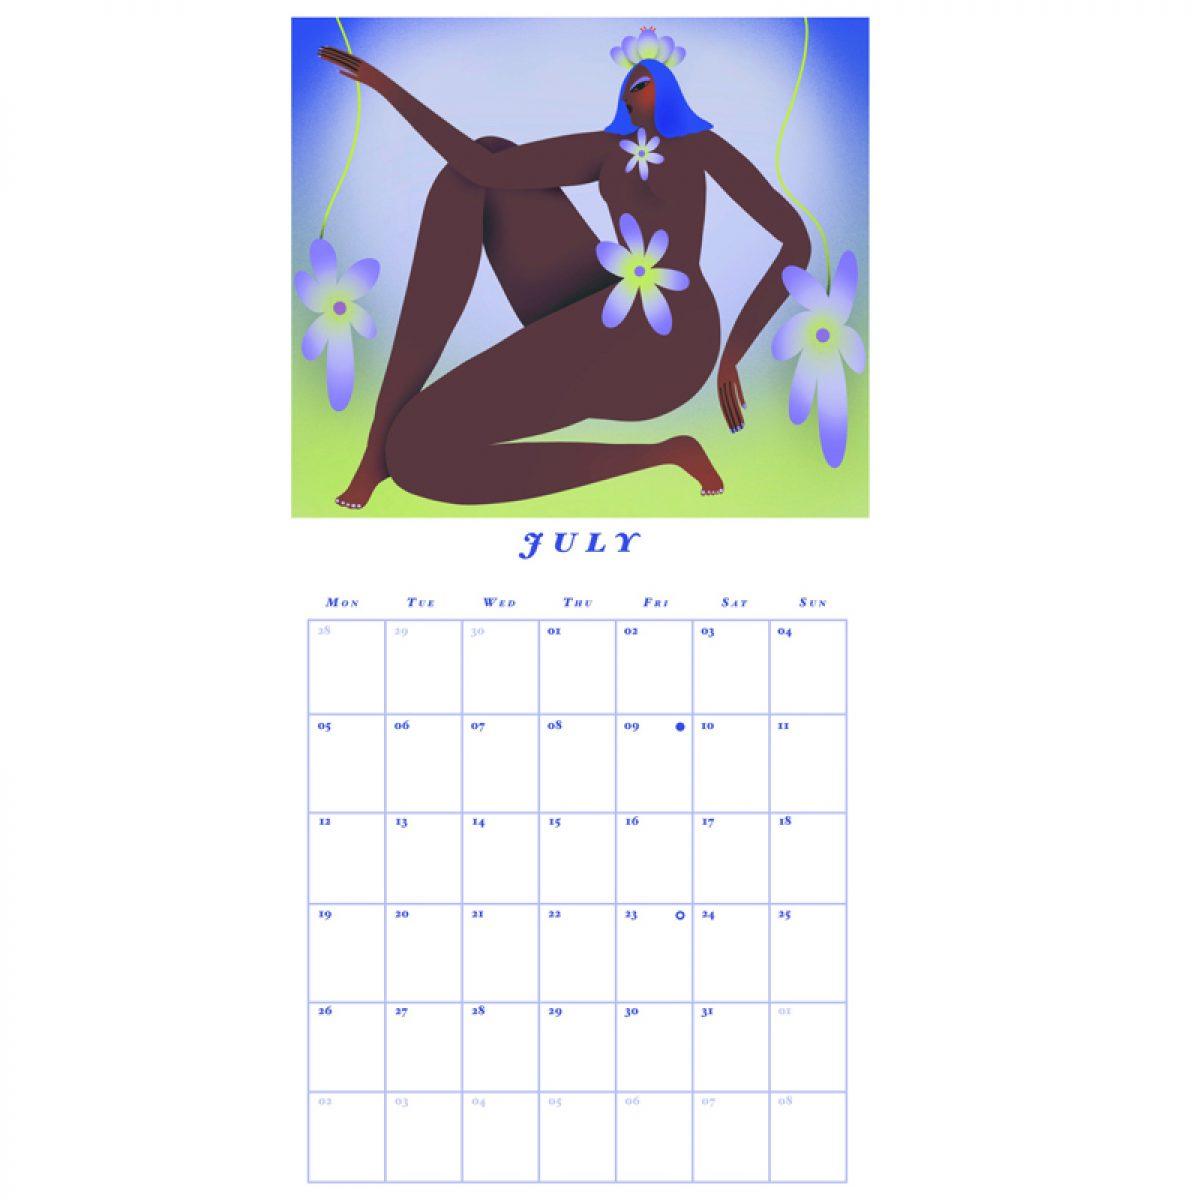 2021 Calendar – Cool Hunting® intended for Hunting Calendar 2021